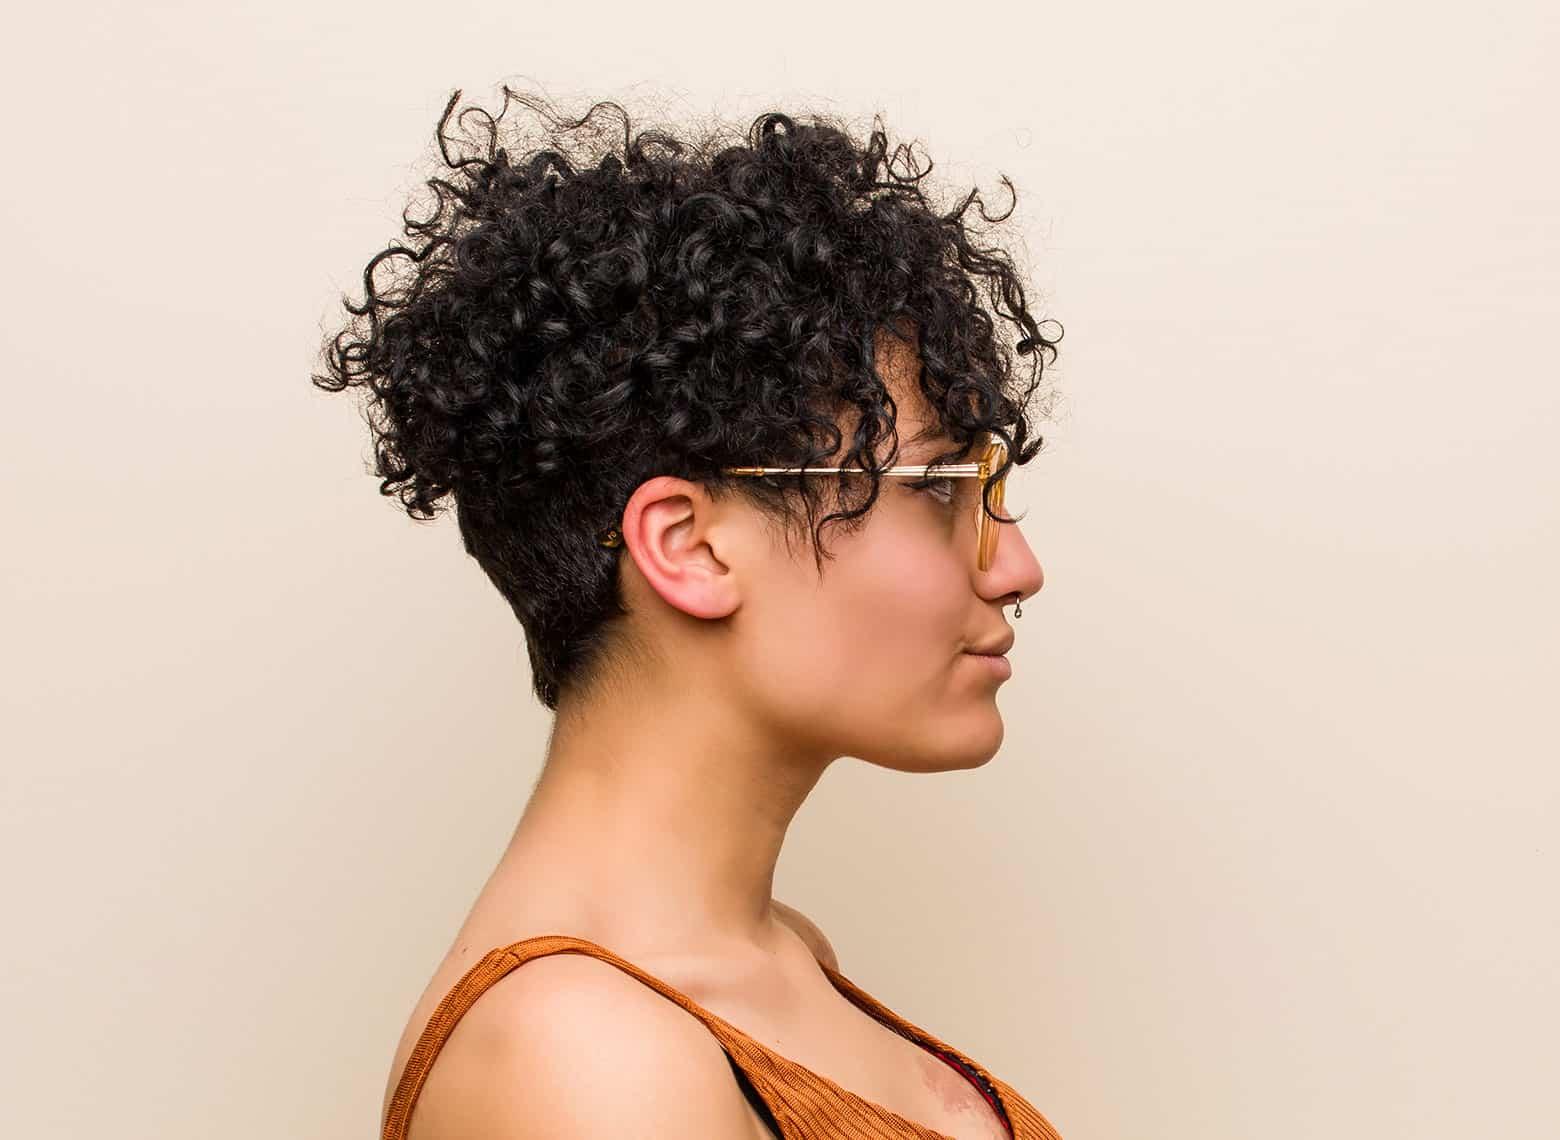 woman with undercut